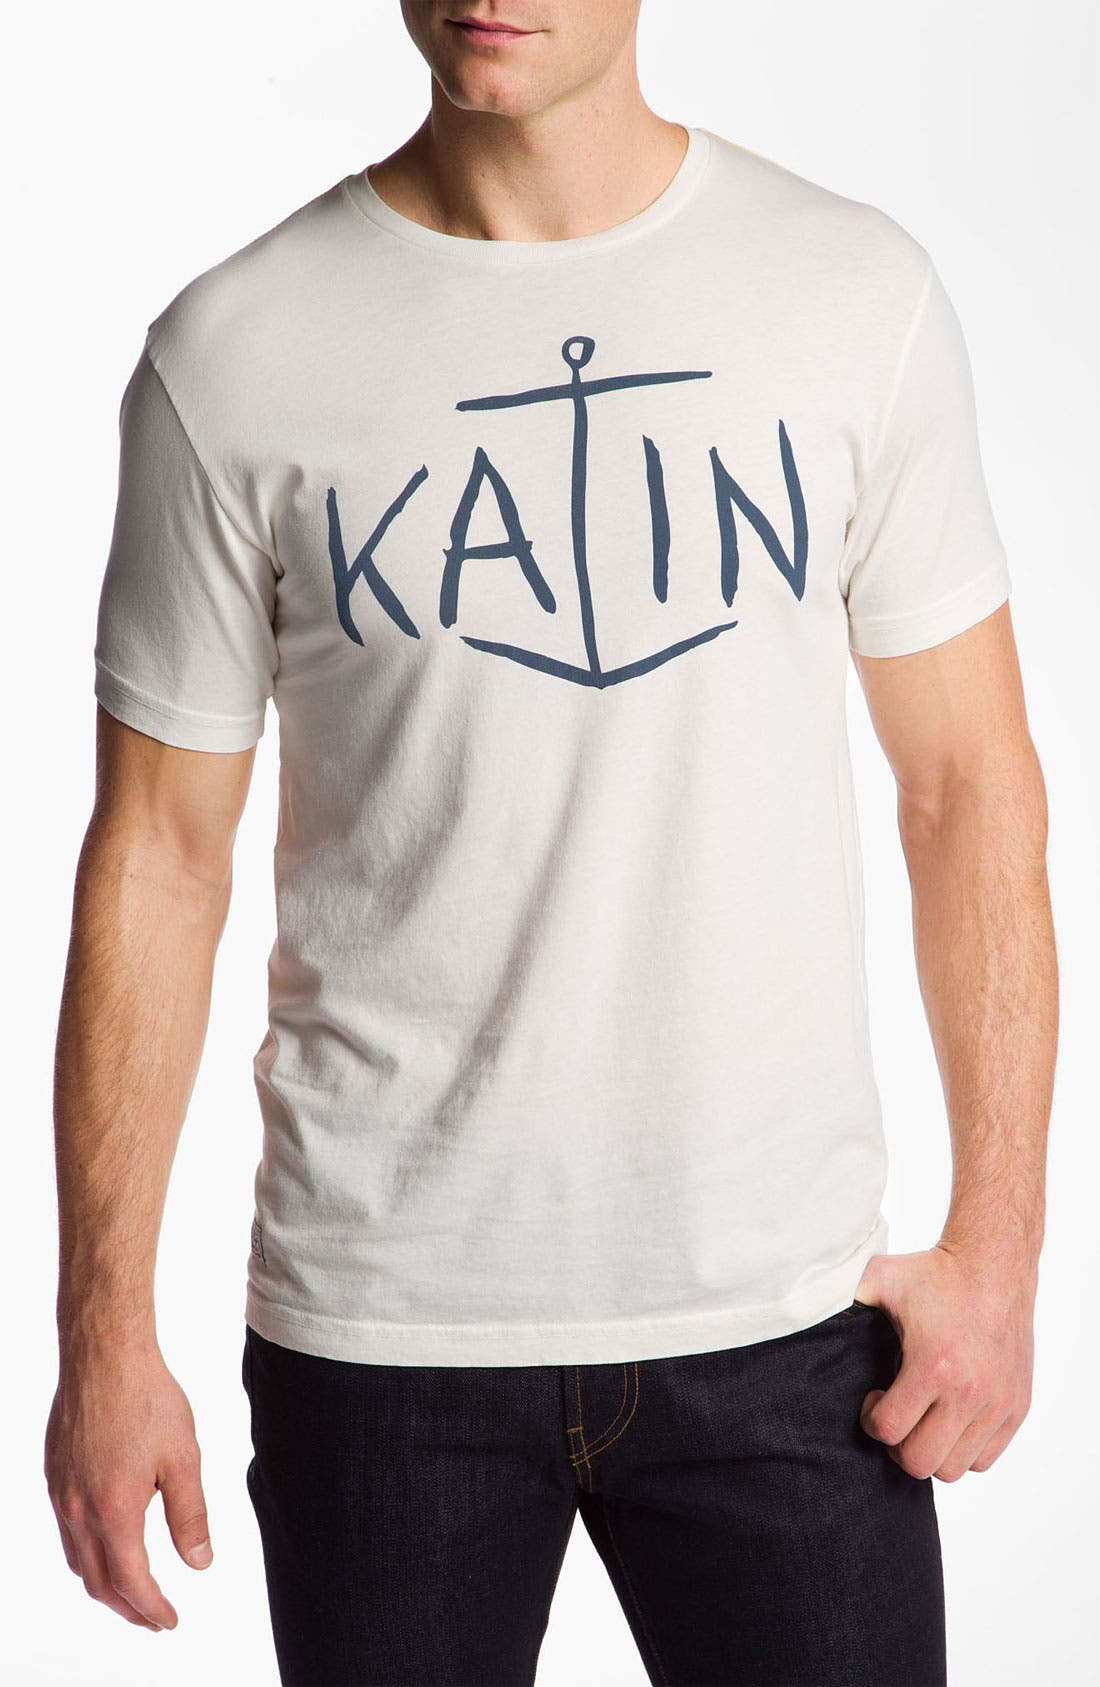 Alternate Image 1 Selected - Katin 'Tanker' T-Shirt